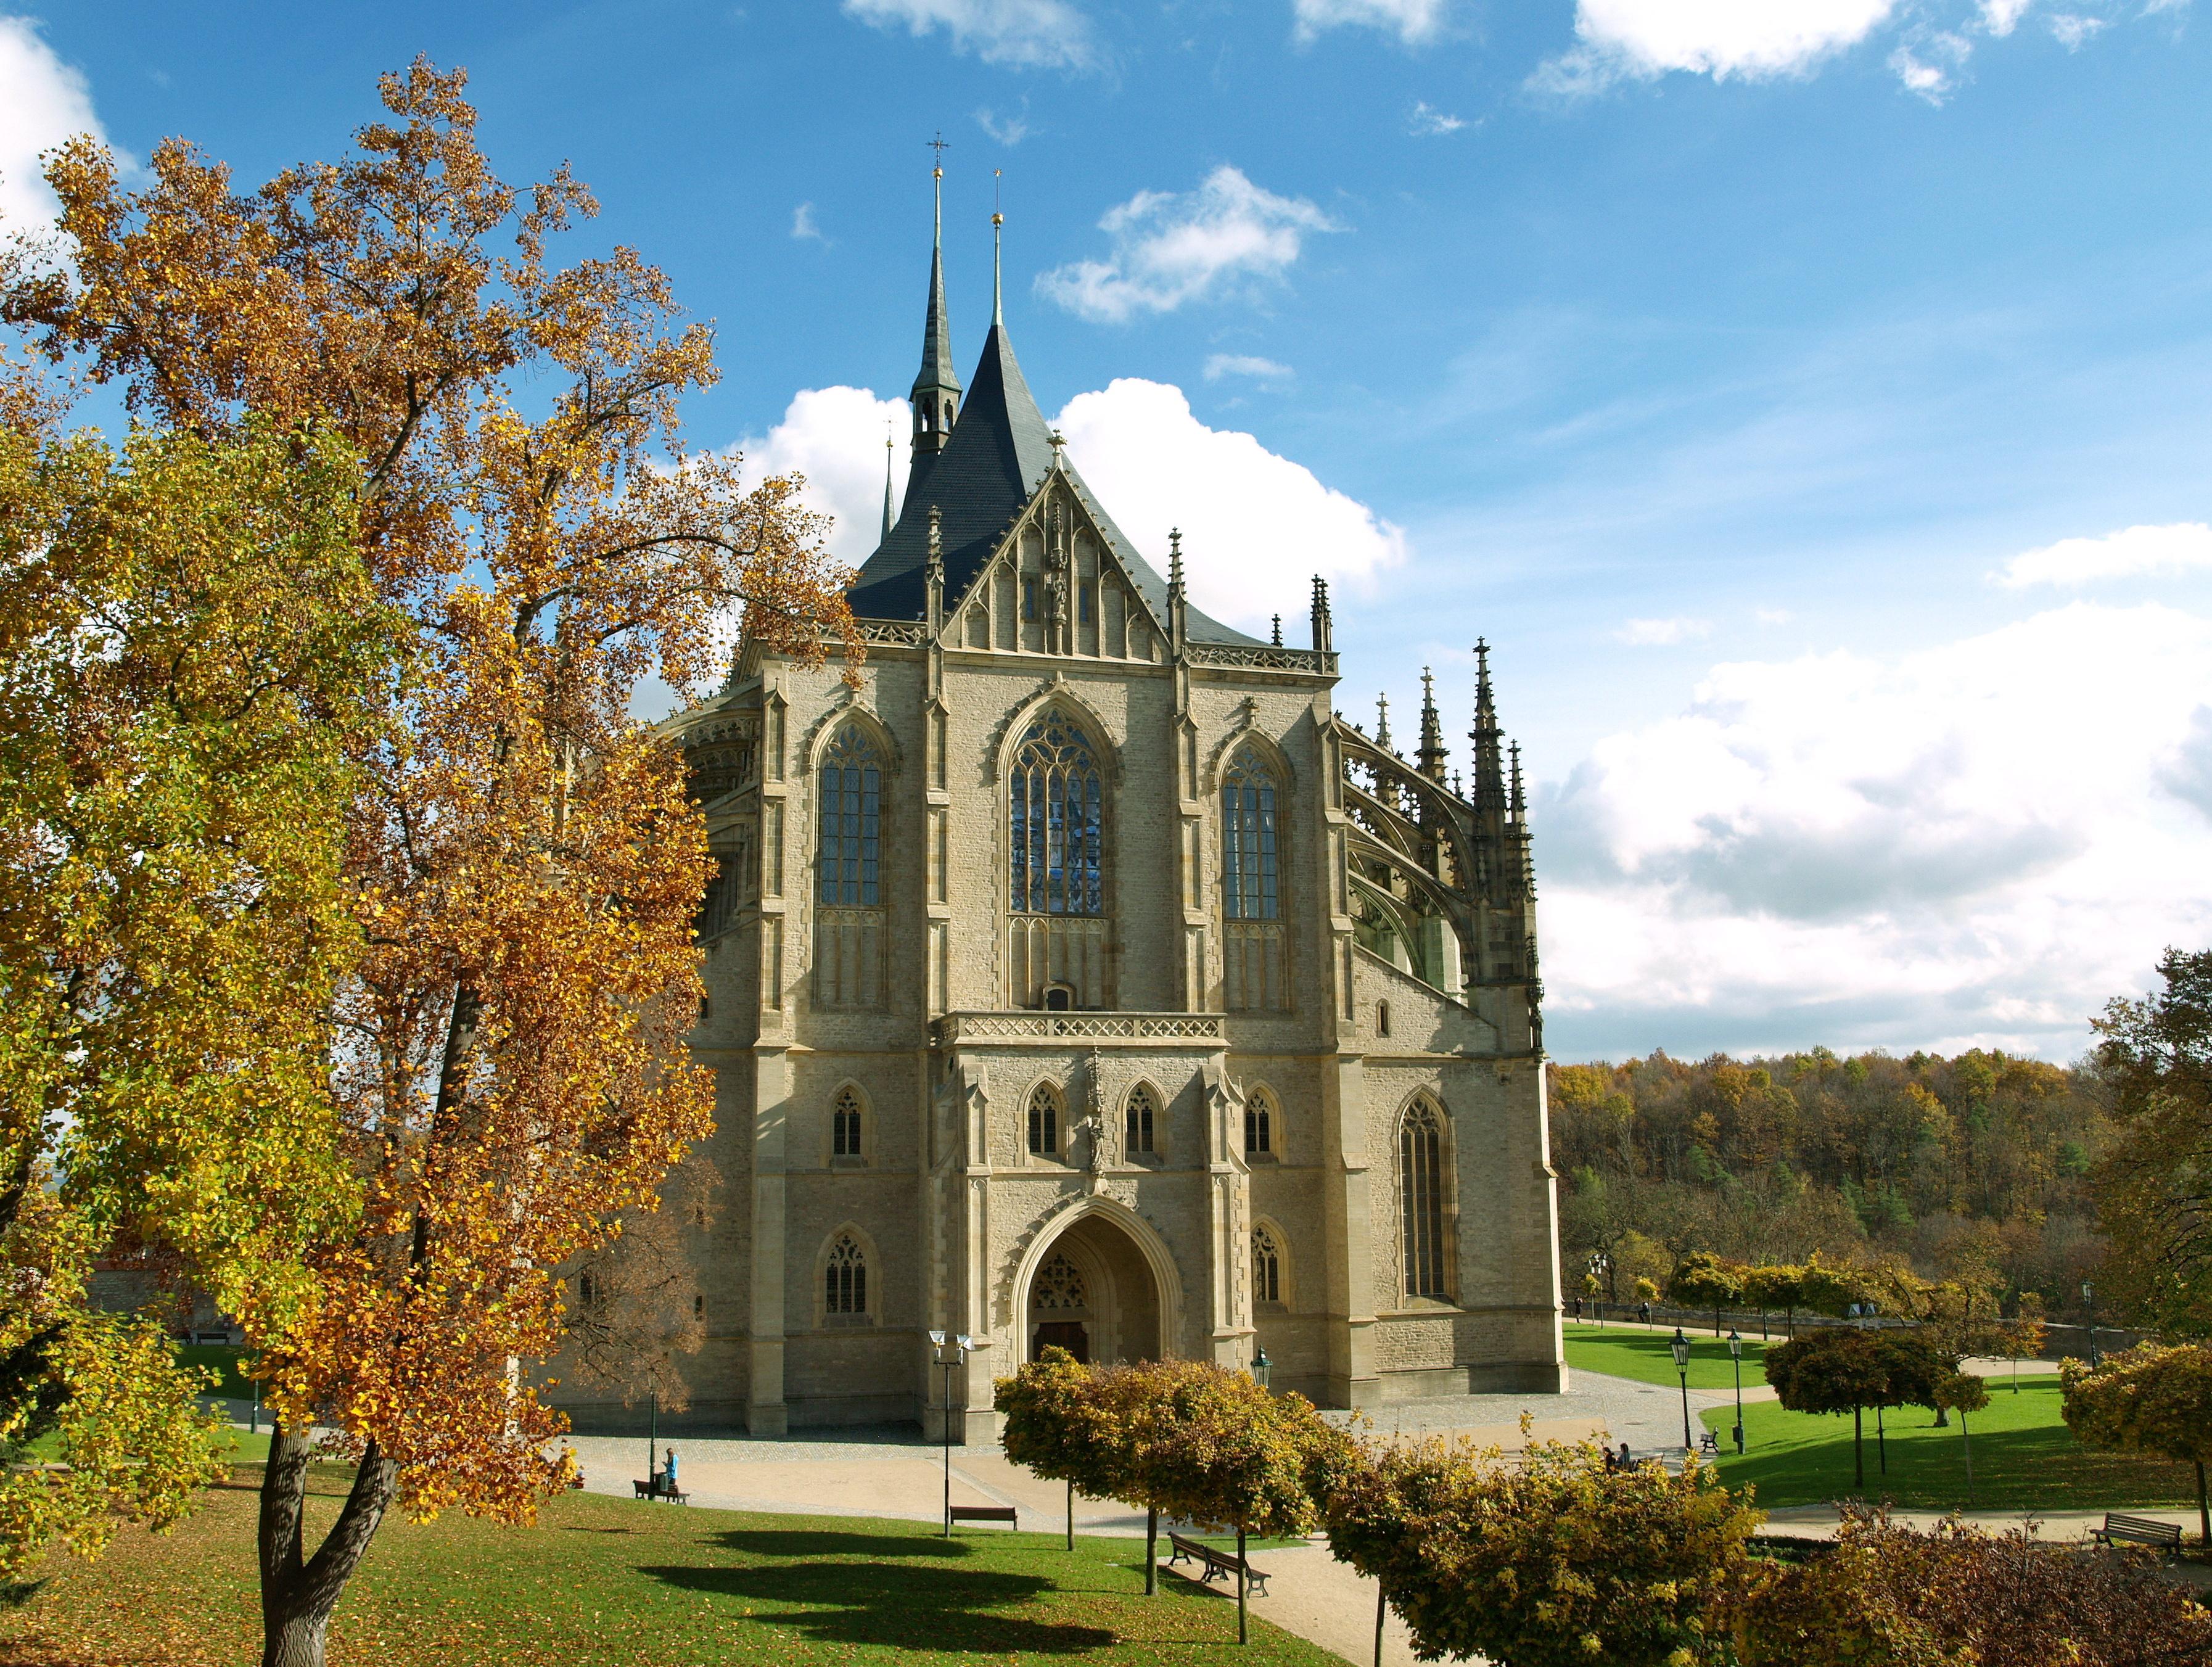 20443-chram-sv-barbory-st-barbara-s-cathedral.jpg